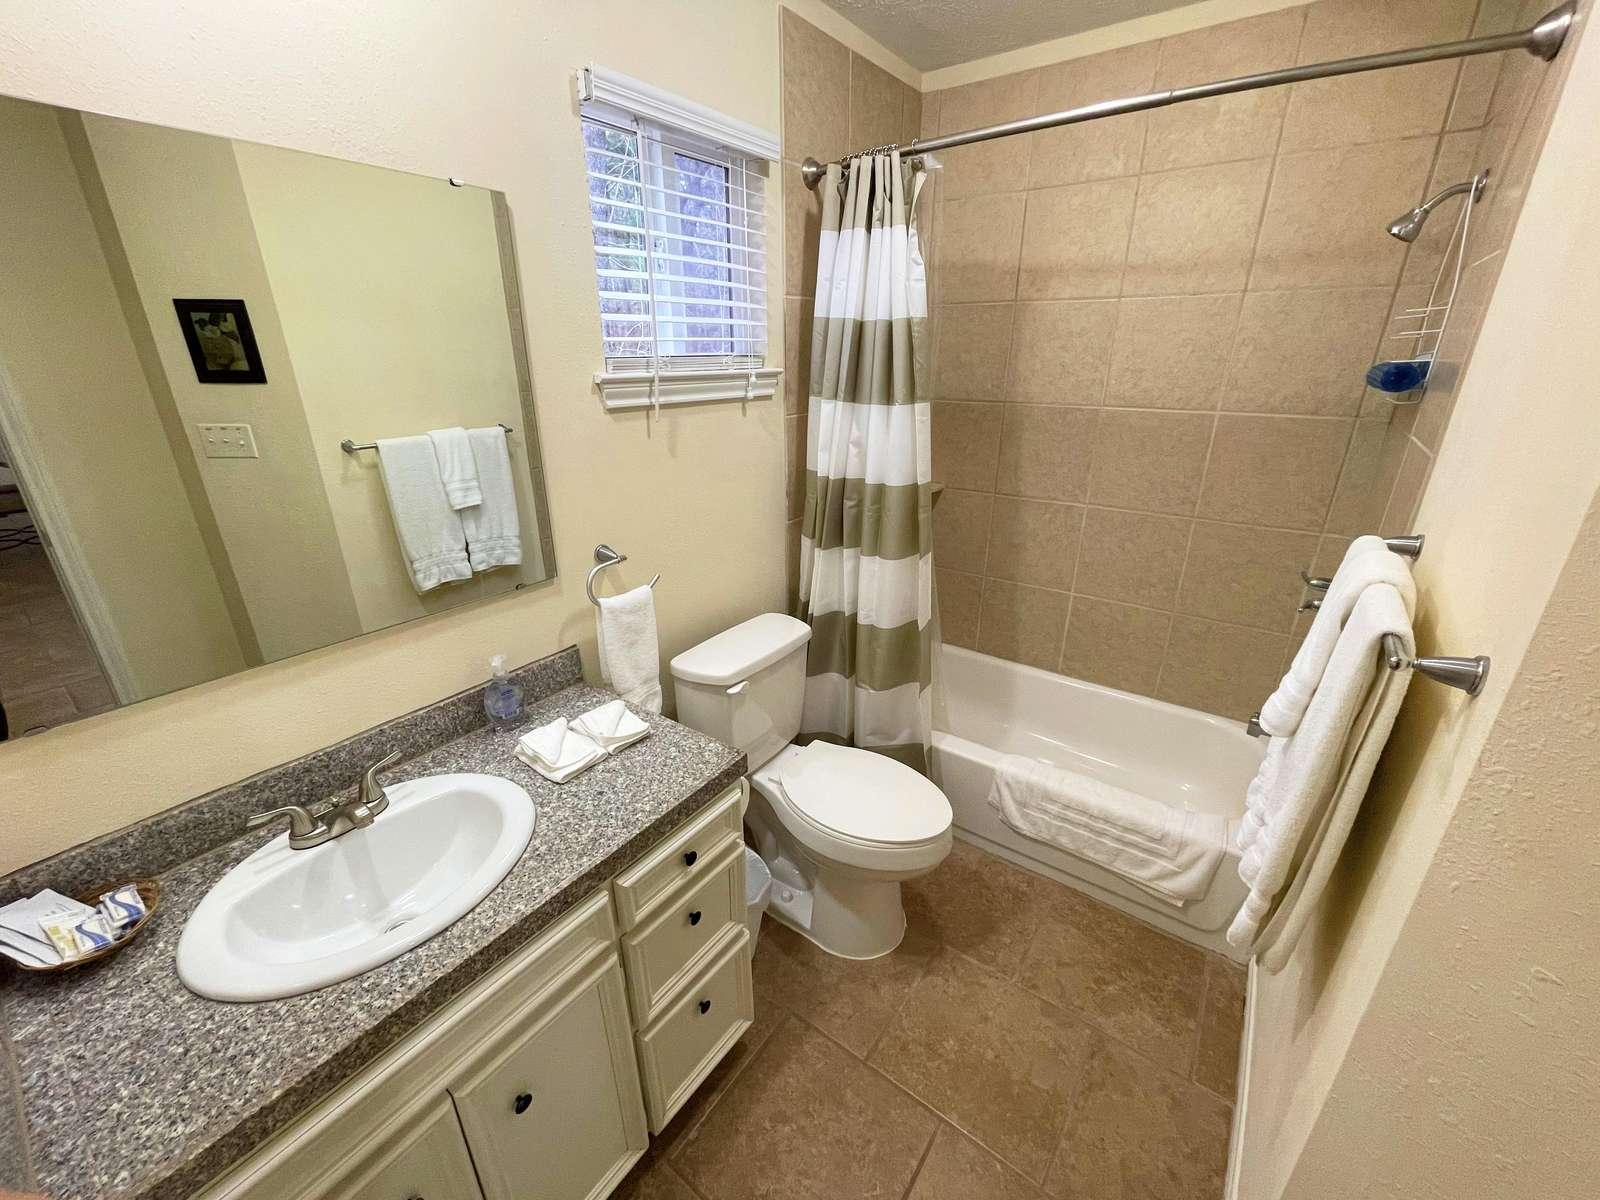 The hall Bathroom with tiled Tub/Shower.